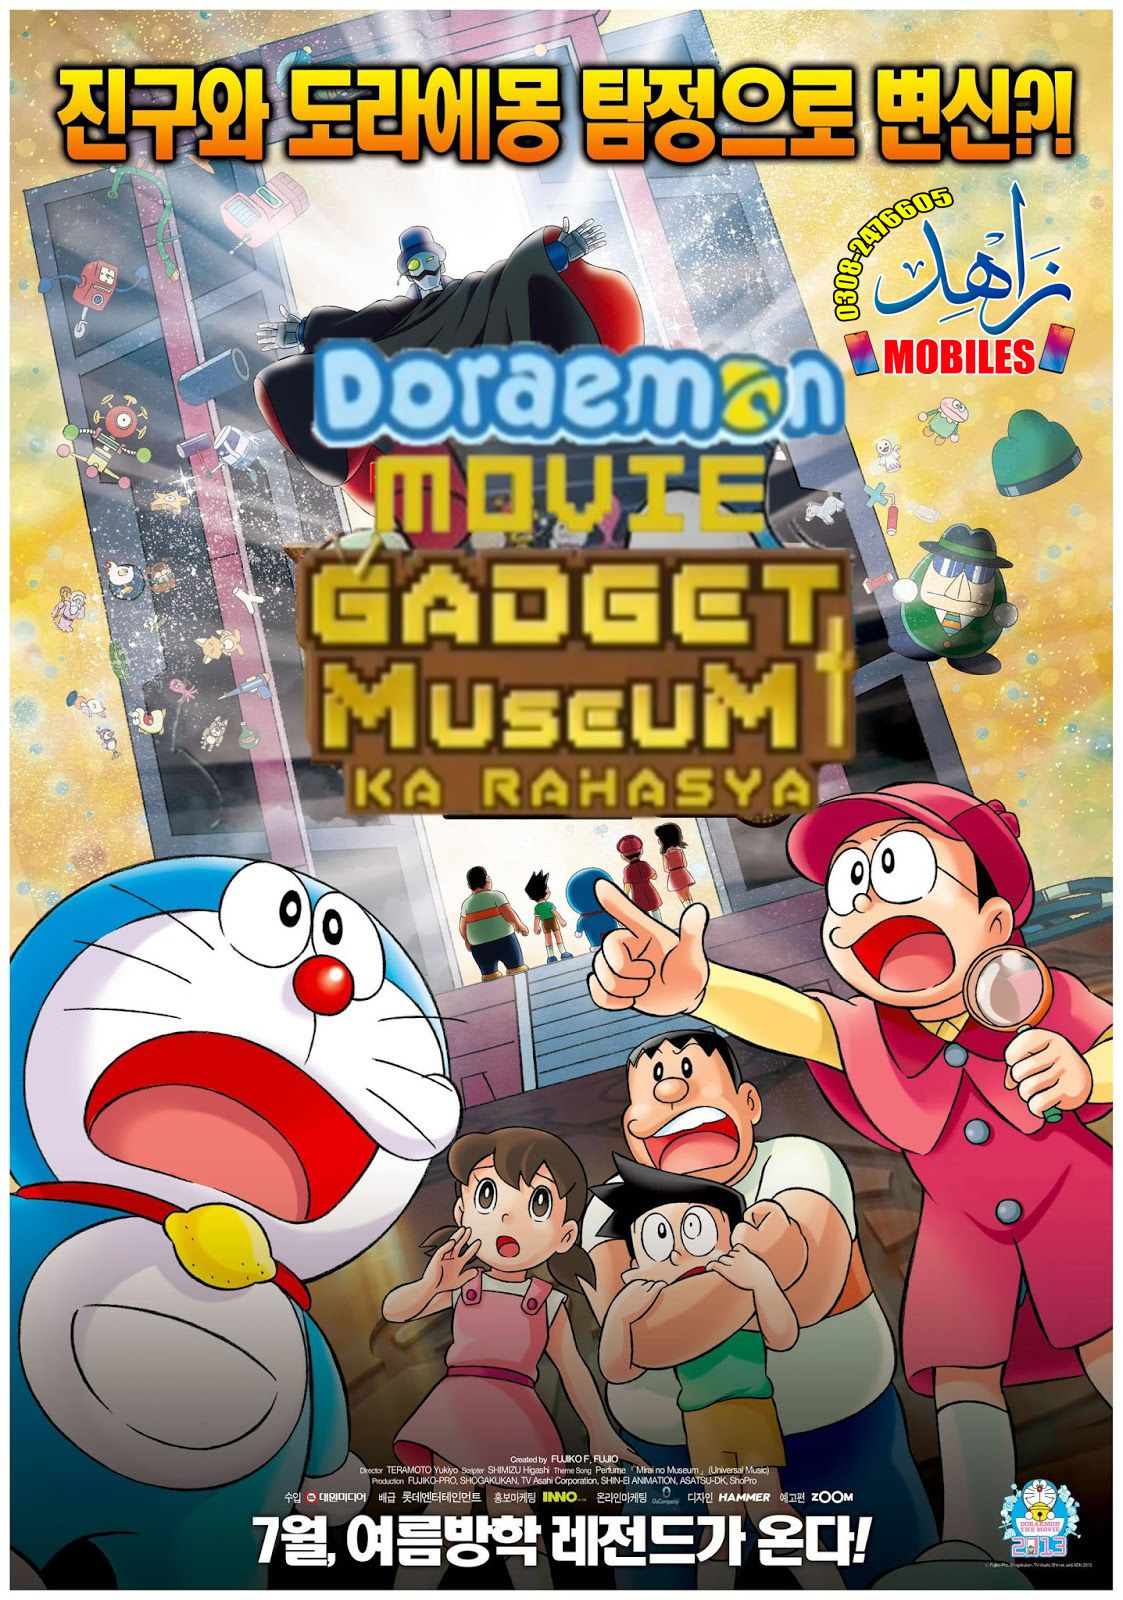 Doraemon The Movie Gadget Museum Ka Rahasya {2013} Hindi Dubbed | 480p | 720p